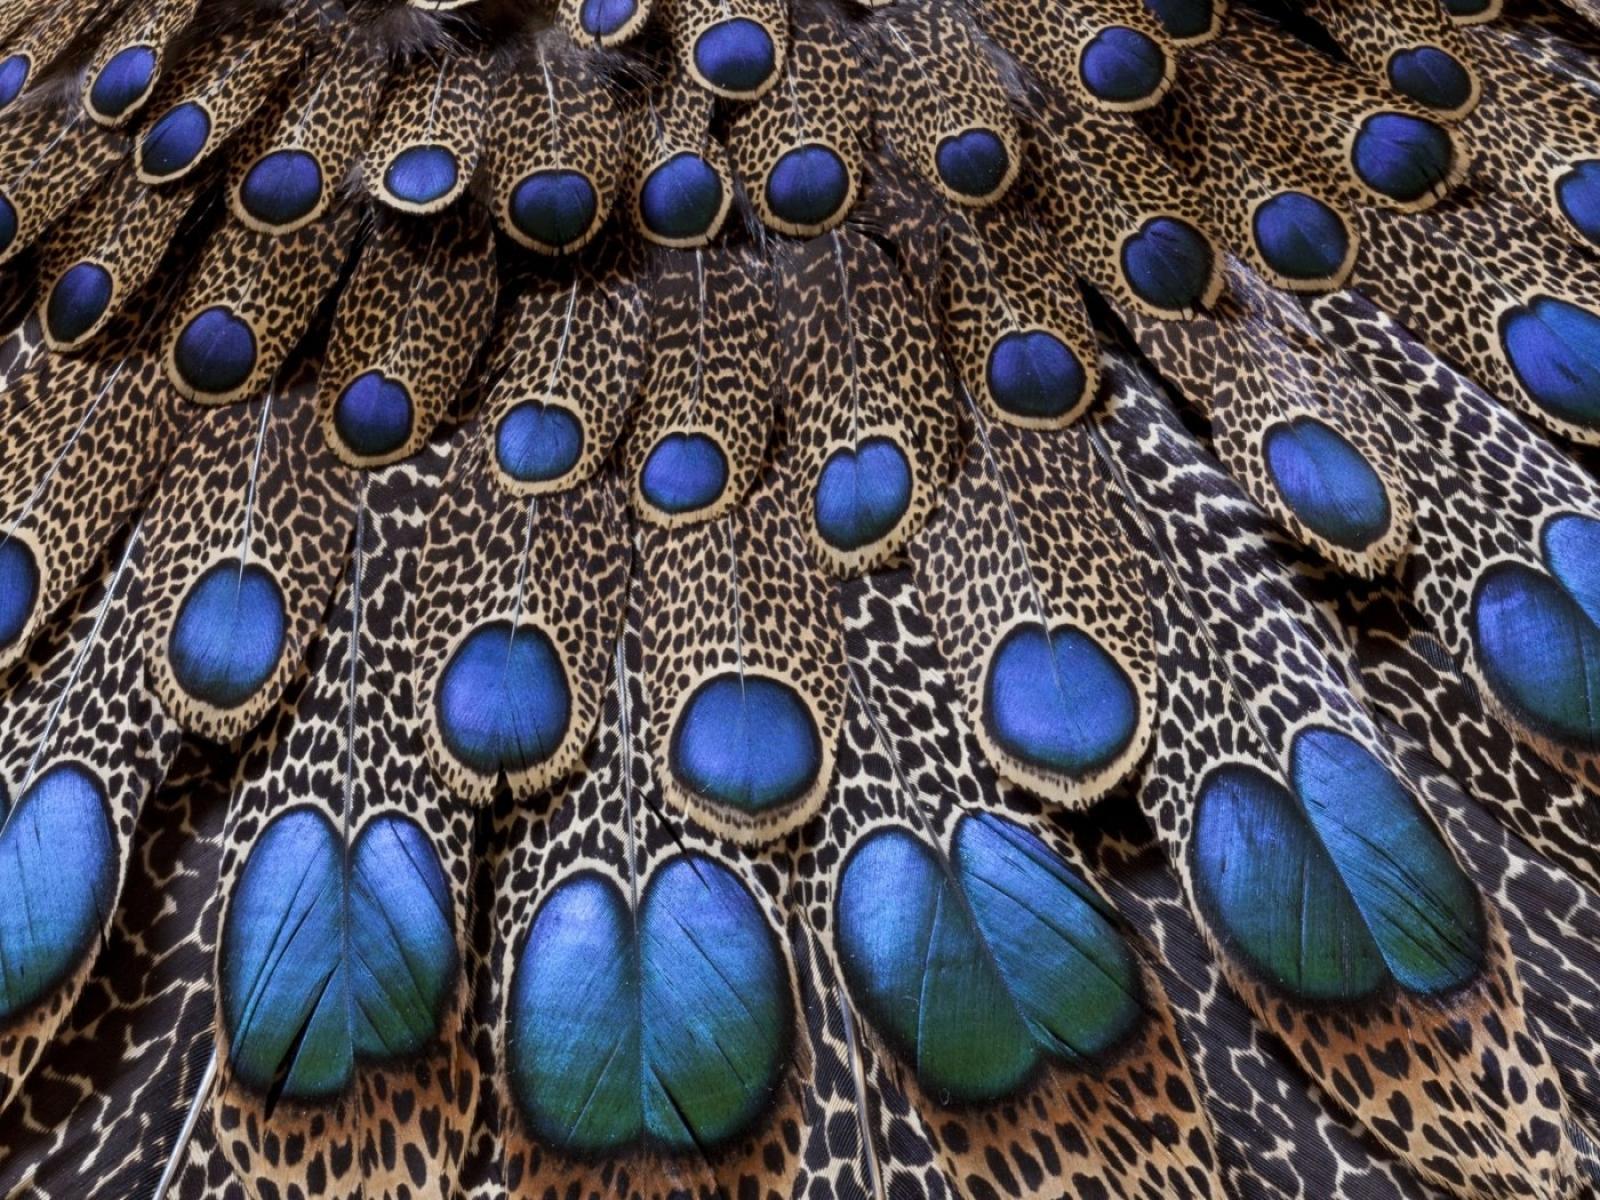 Peacock Bird Feathers Wallpaper   HD Wallpapers 1600x1200